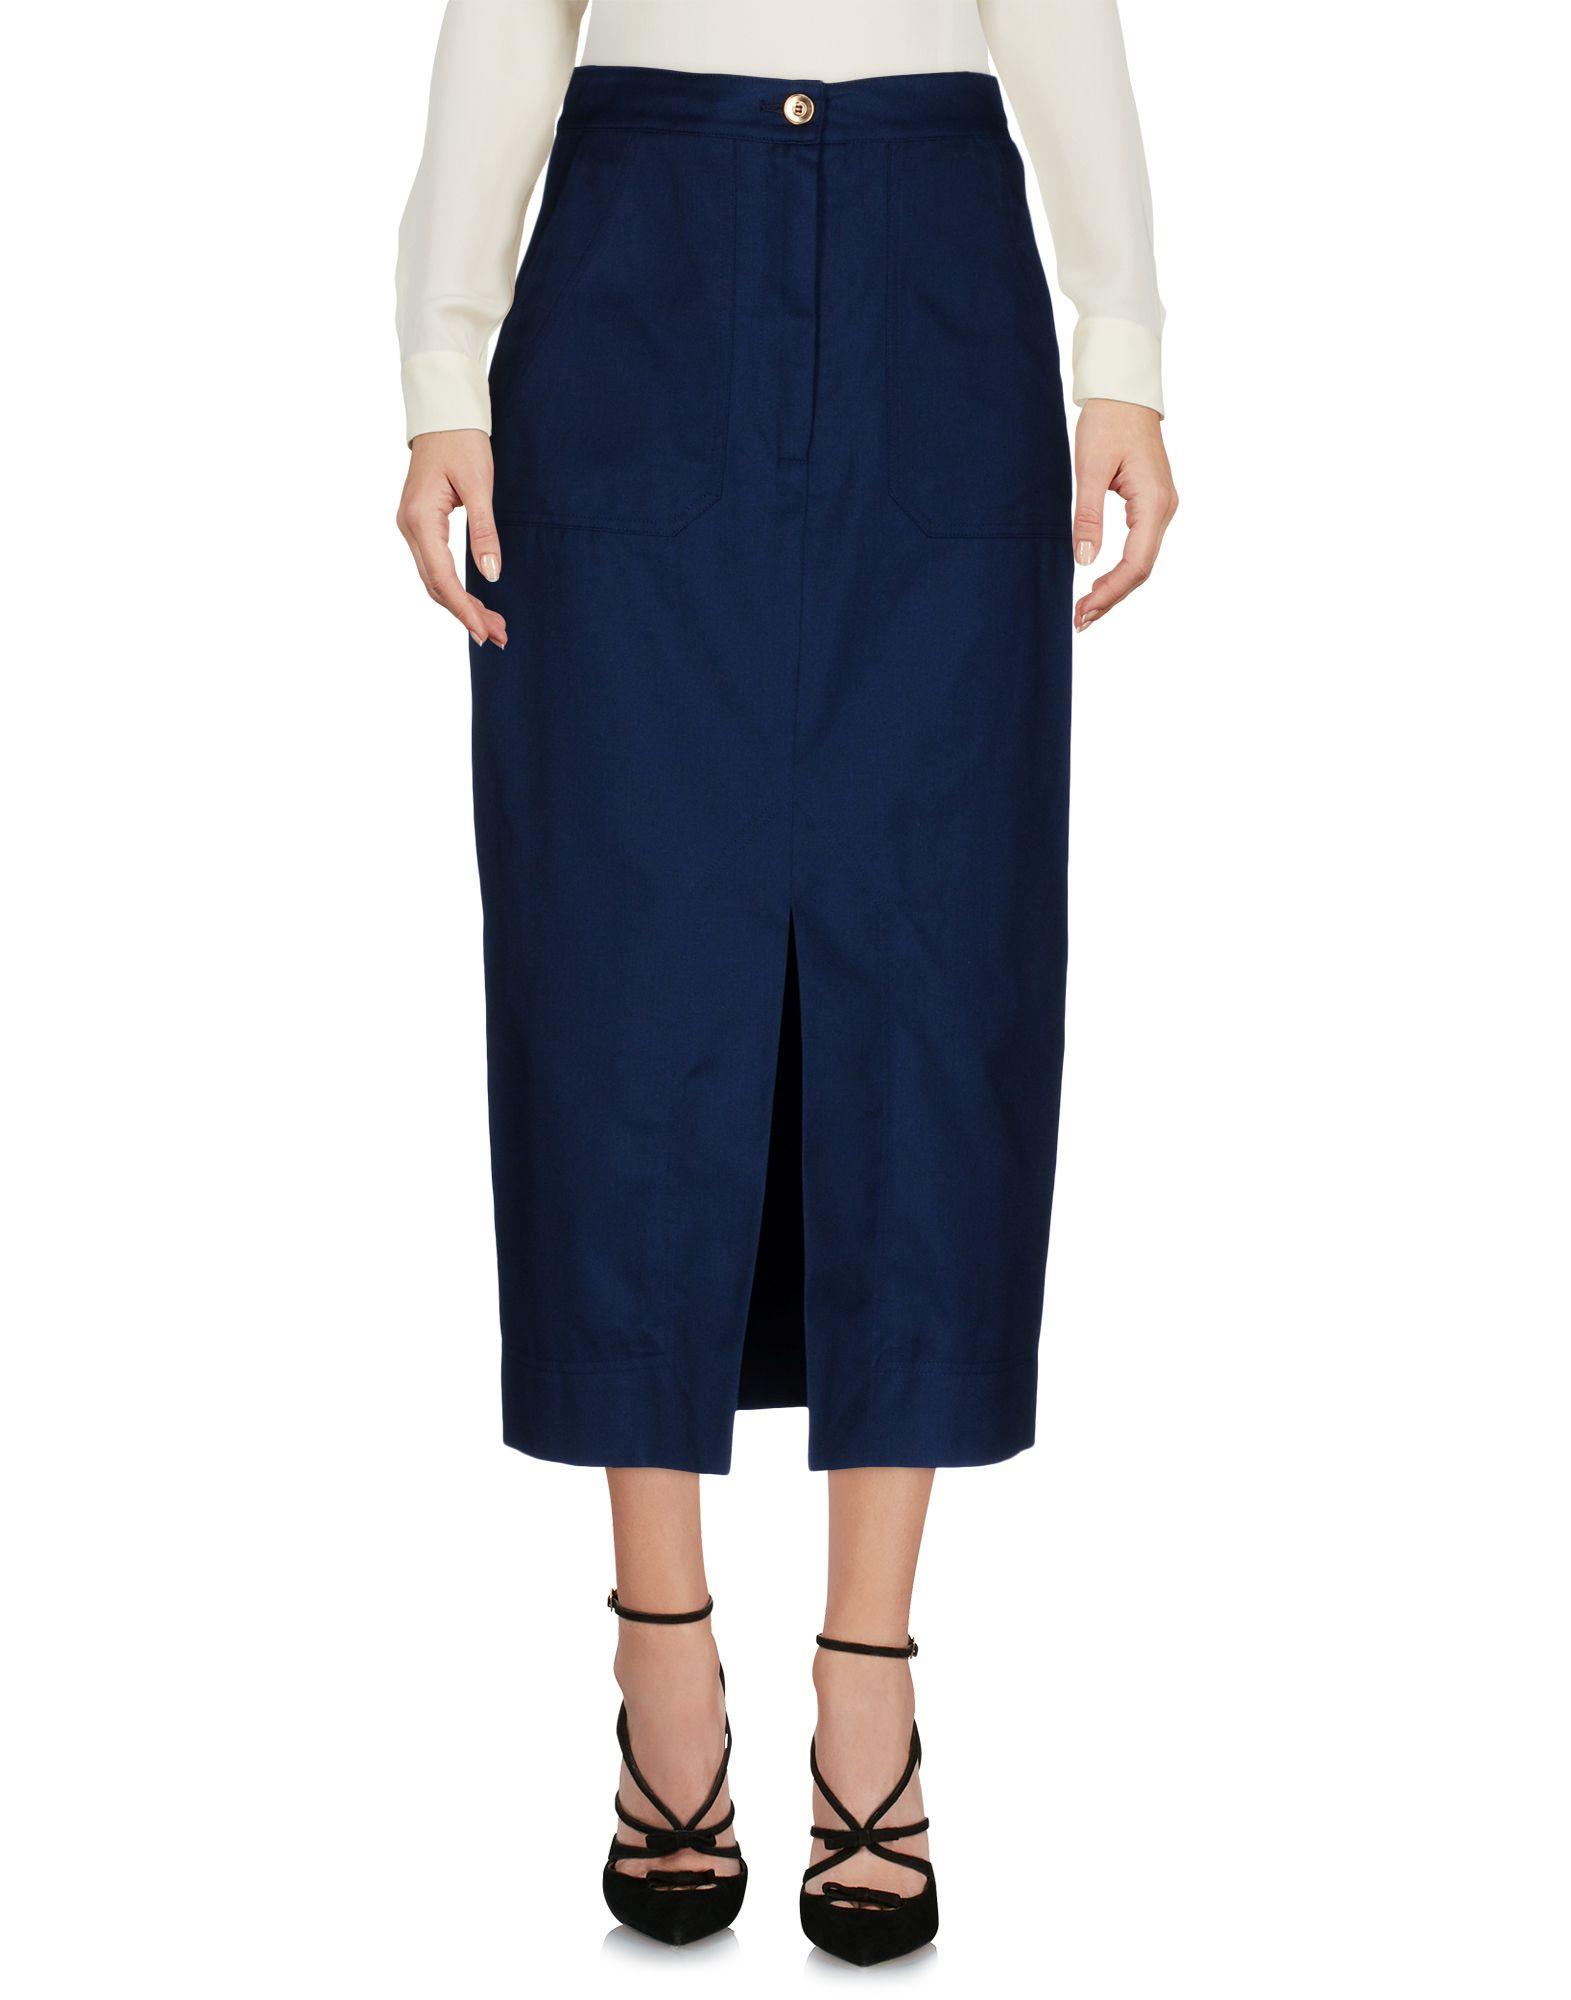 J.WON Midi Skirts in Dark Blue